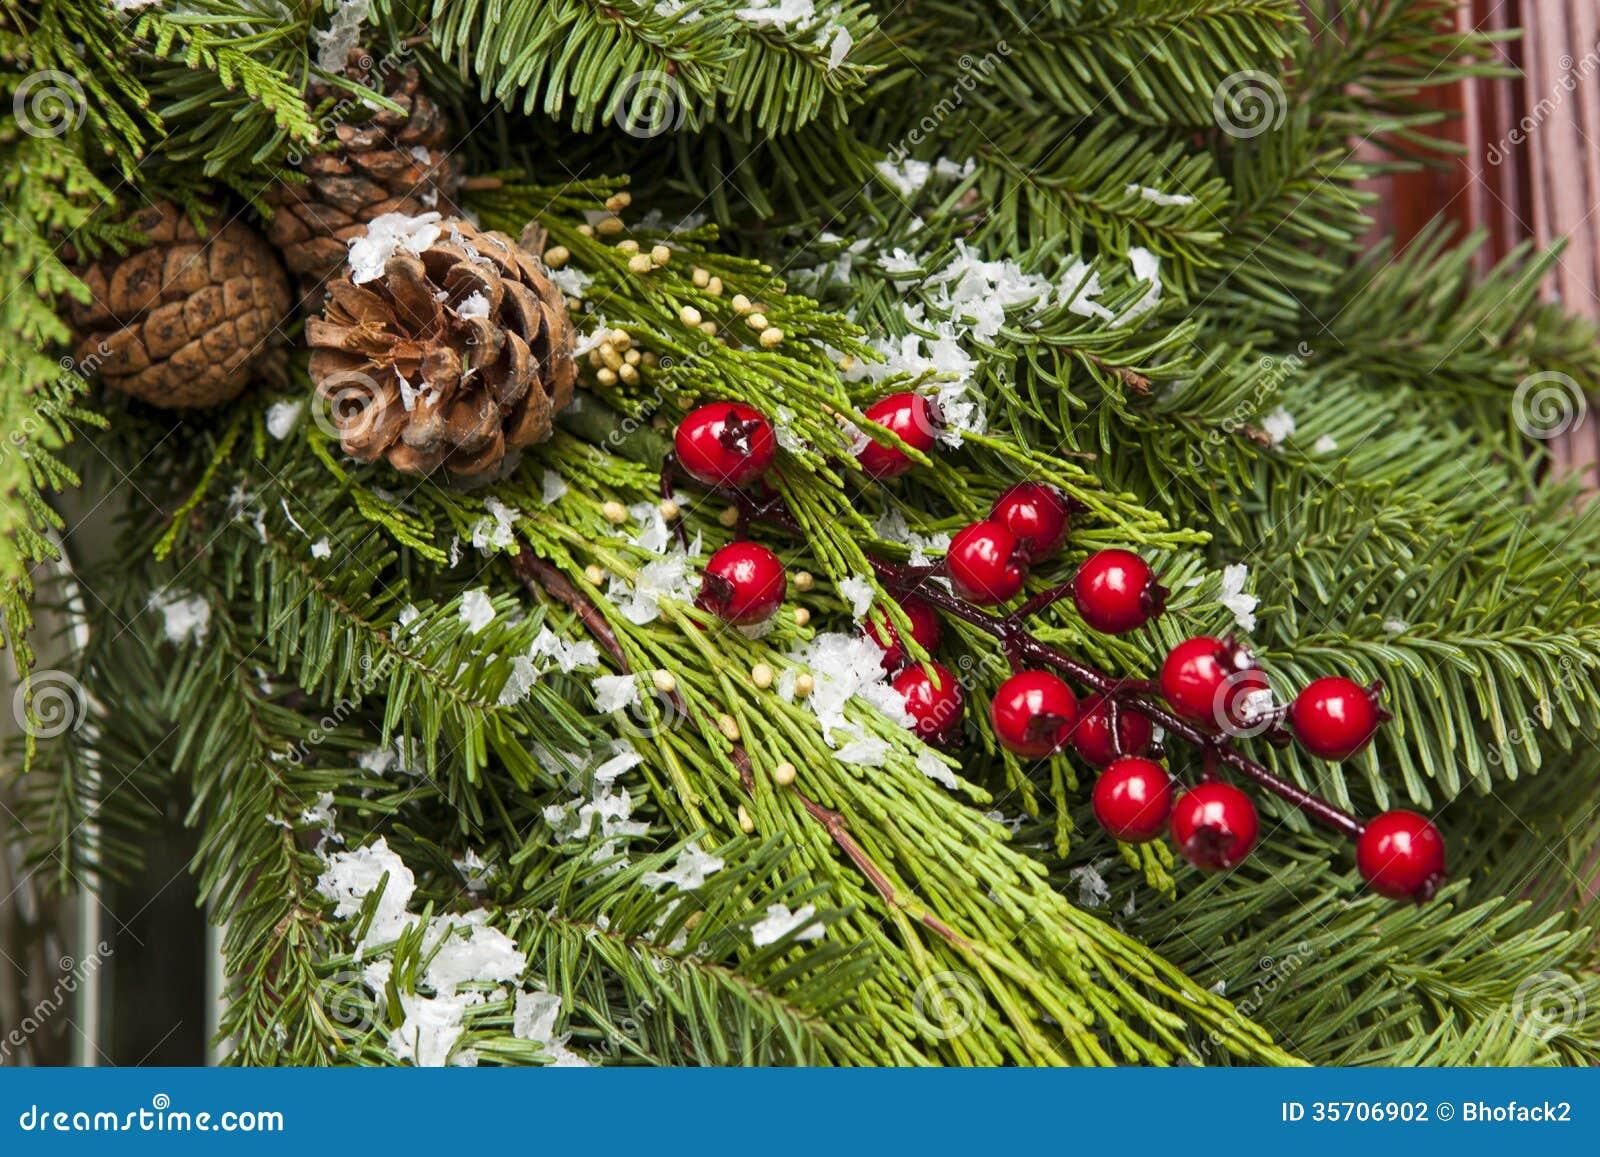 Evergreen Christmas.Green Holiday Christmas Decoration Stock Photo Image Of